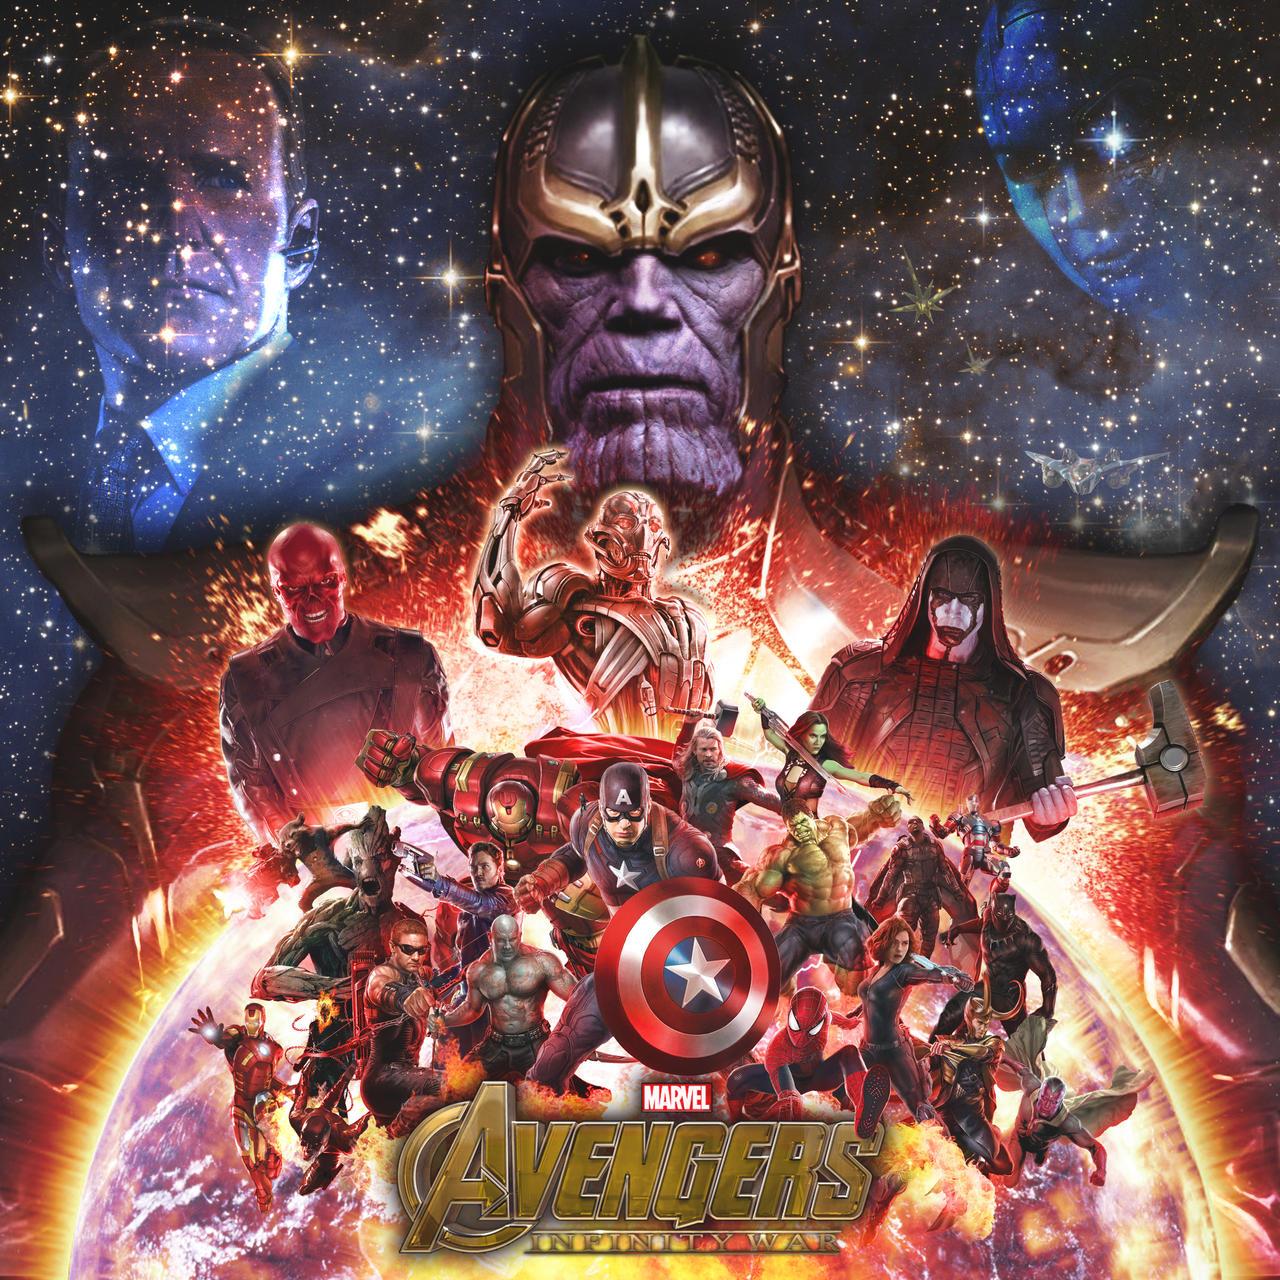 Great Scott Lang Infinity War Wallpaper - avengers__infinity_war_by_chedsorr-d8hir8n  2018_396660 .jpg